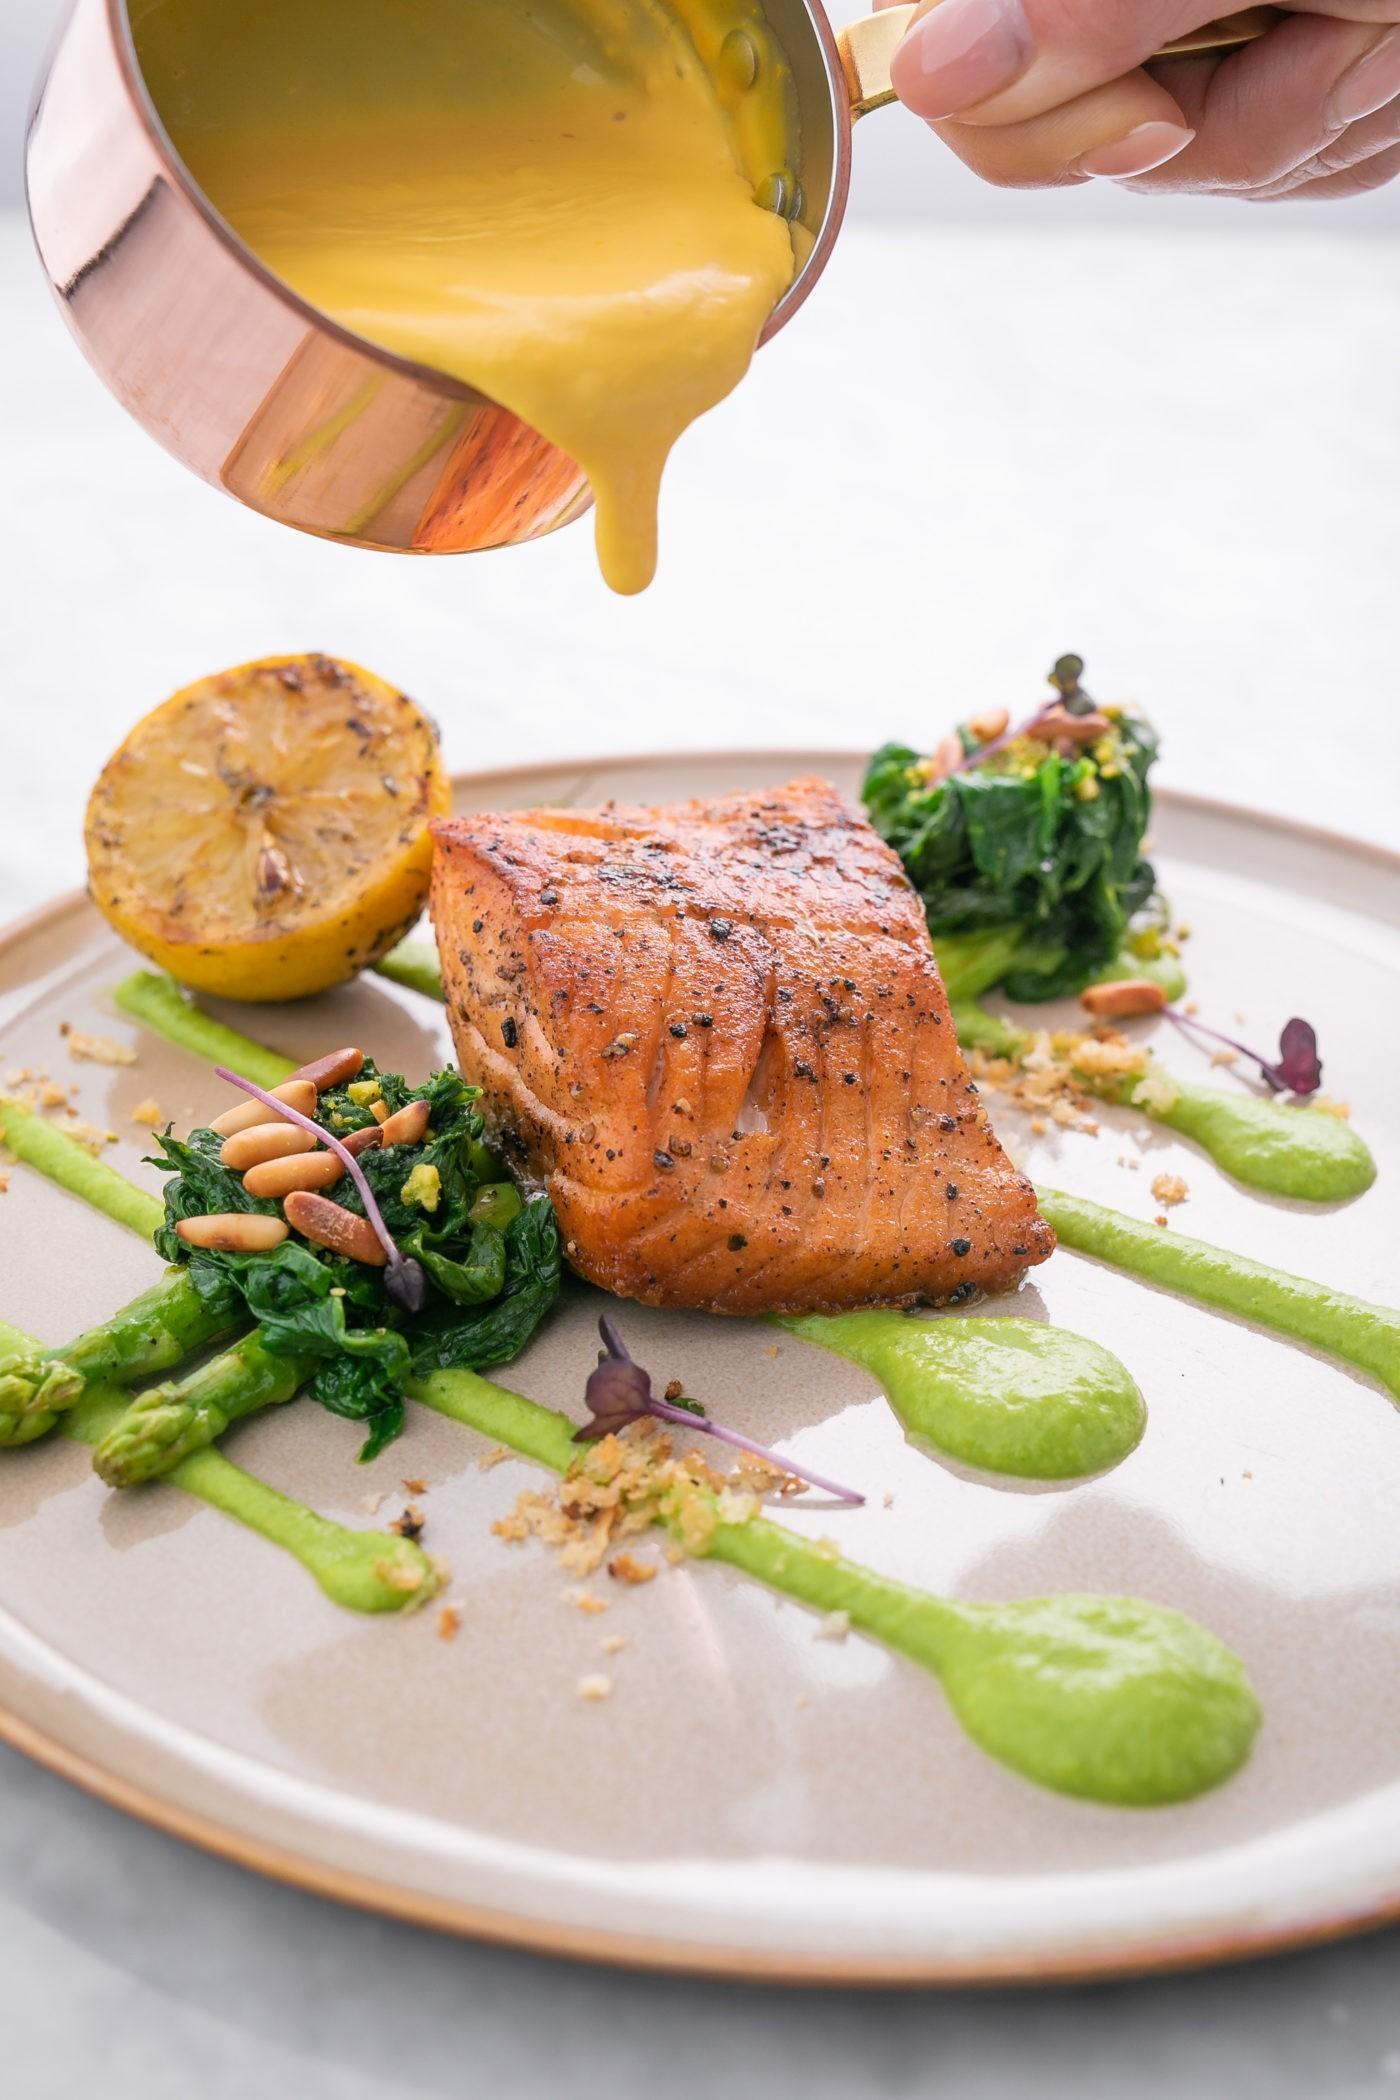 15 1400x2100 - Food Photography